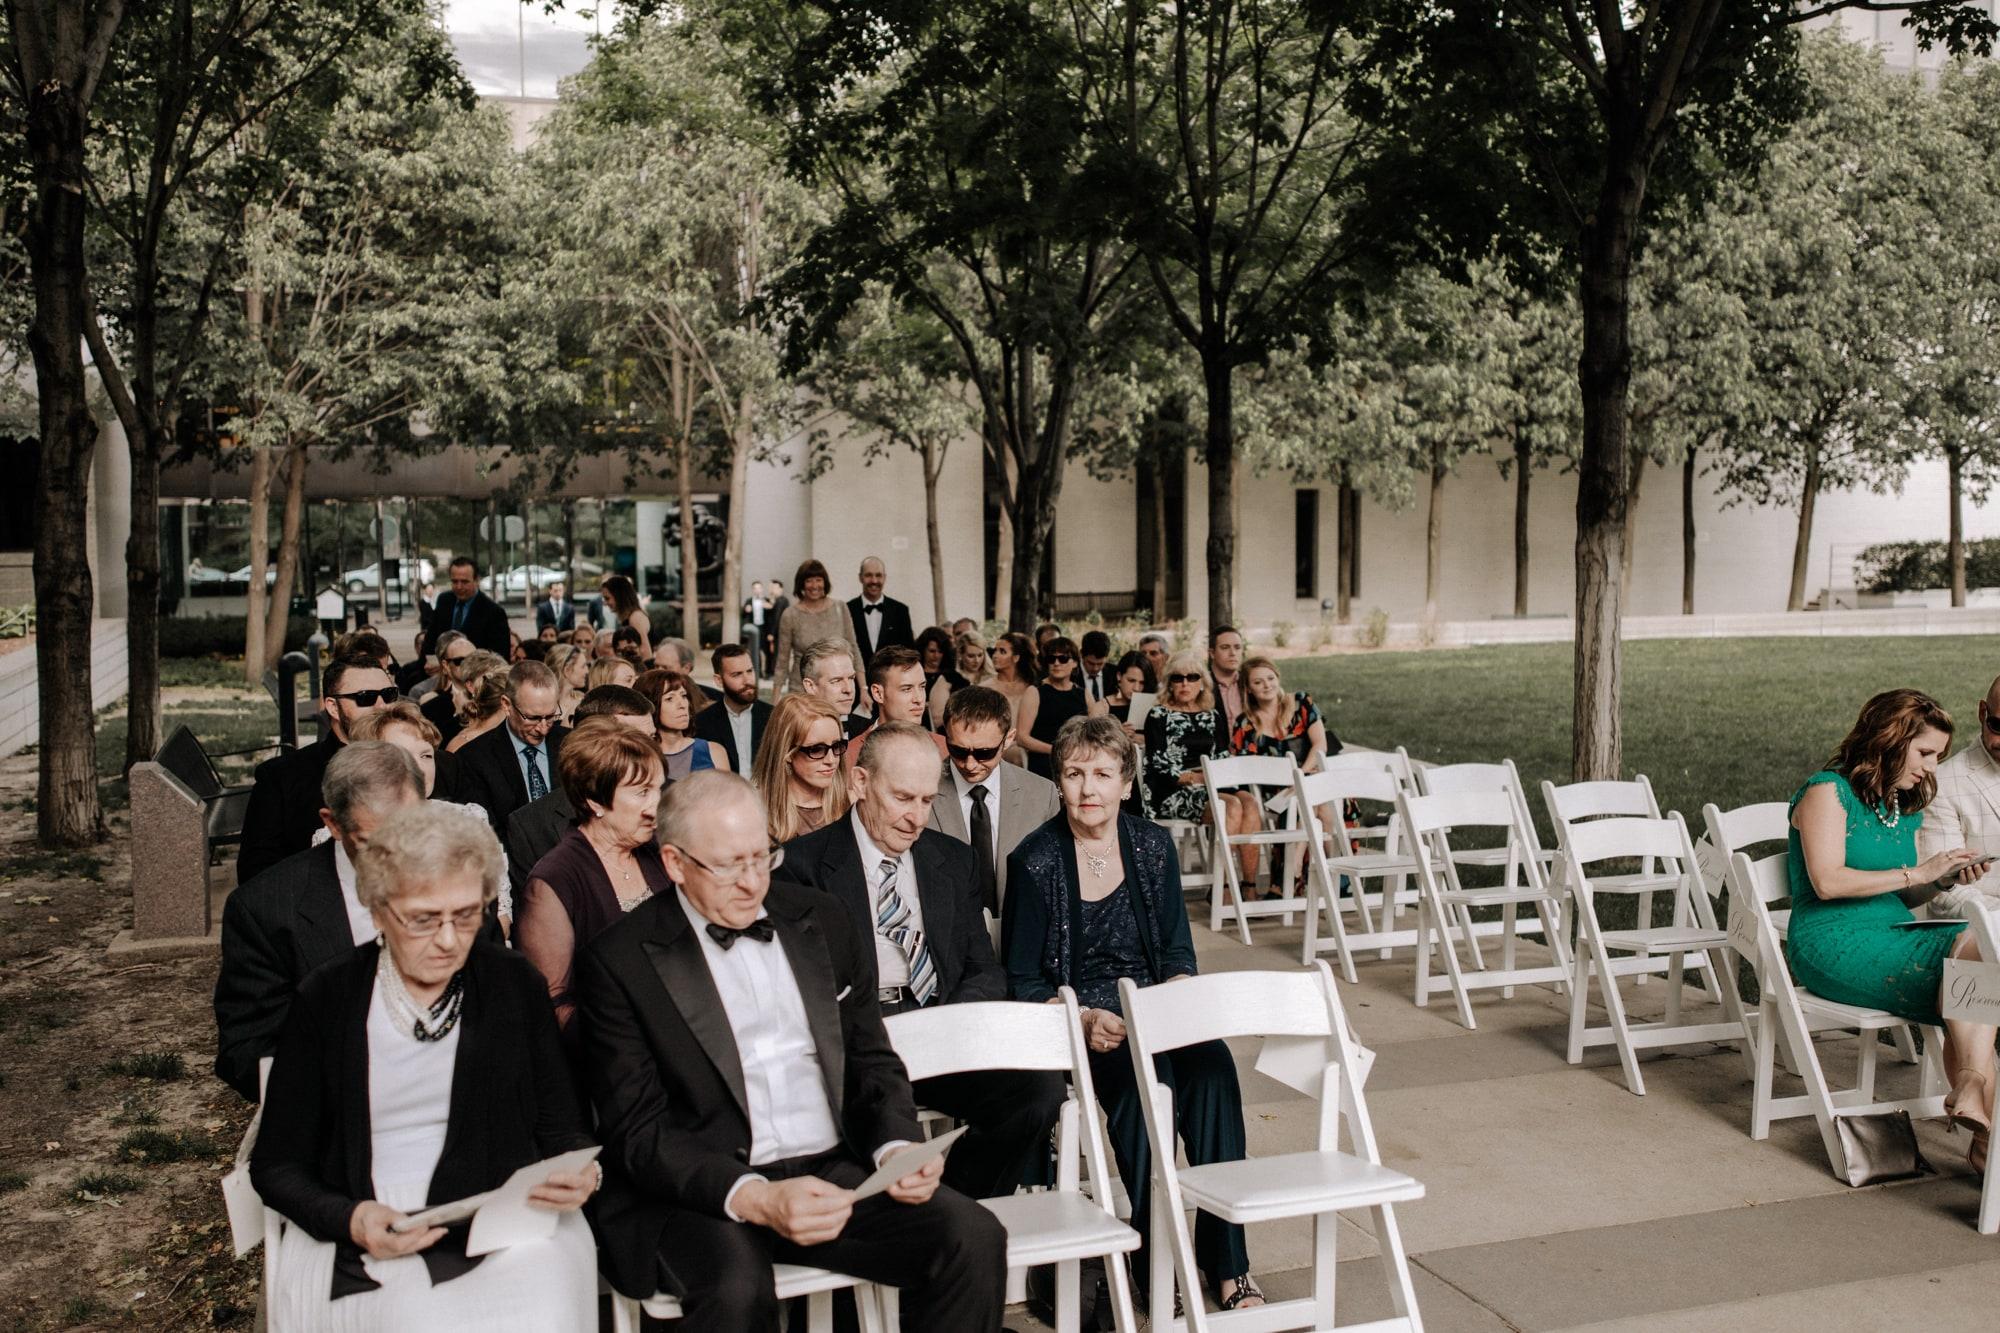 MIA-Minneapolis-Institute-Art-Summer-Wedding-_25.jpg